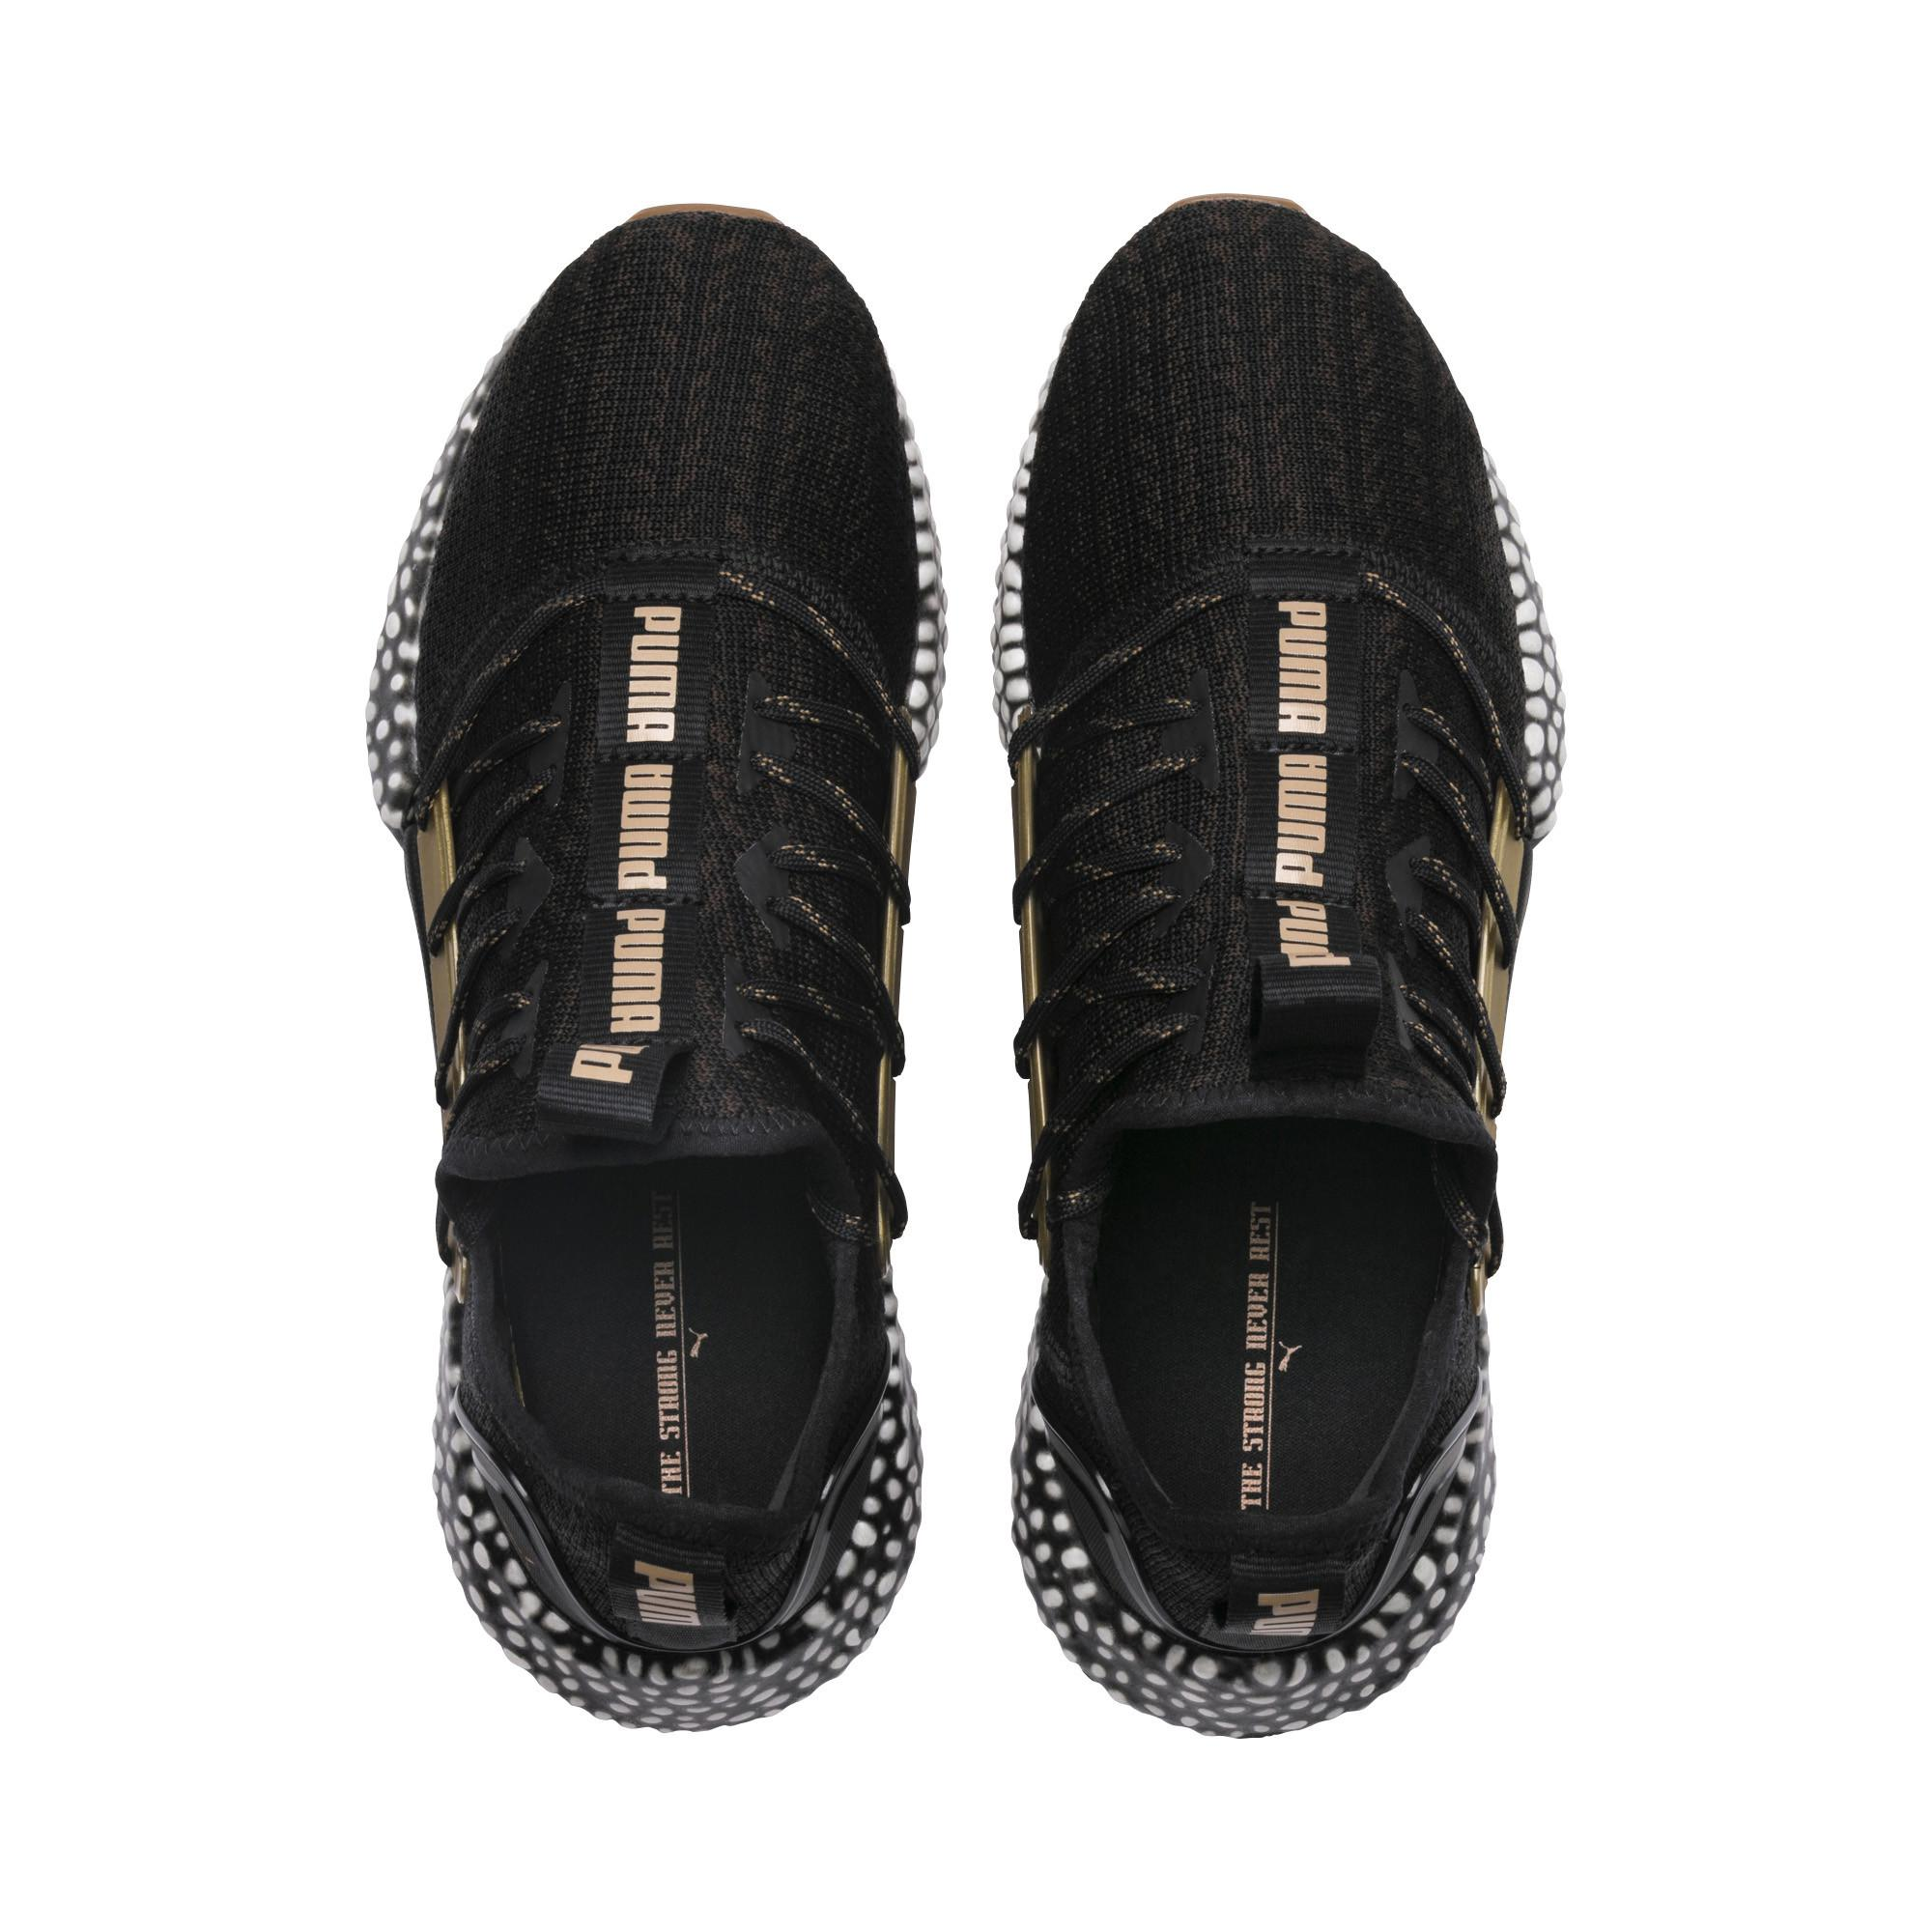 f943c22f2fcfbb Lyst - PUMA Hybrid Rocket Desert Men s Running Shoes in Black